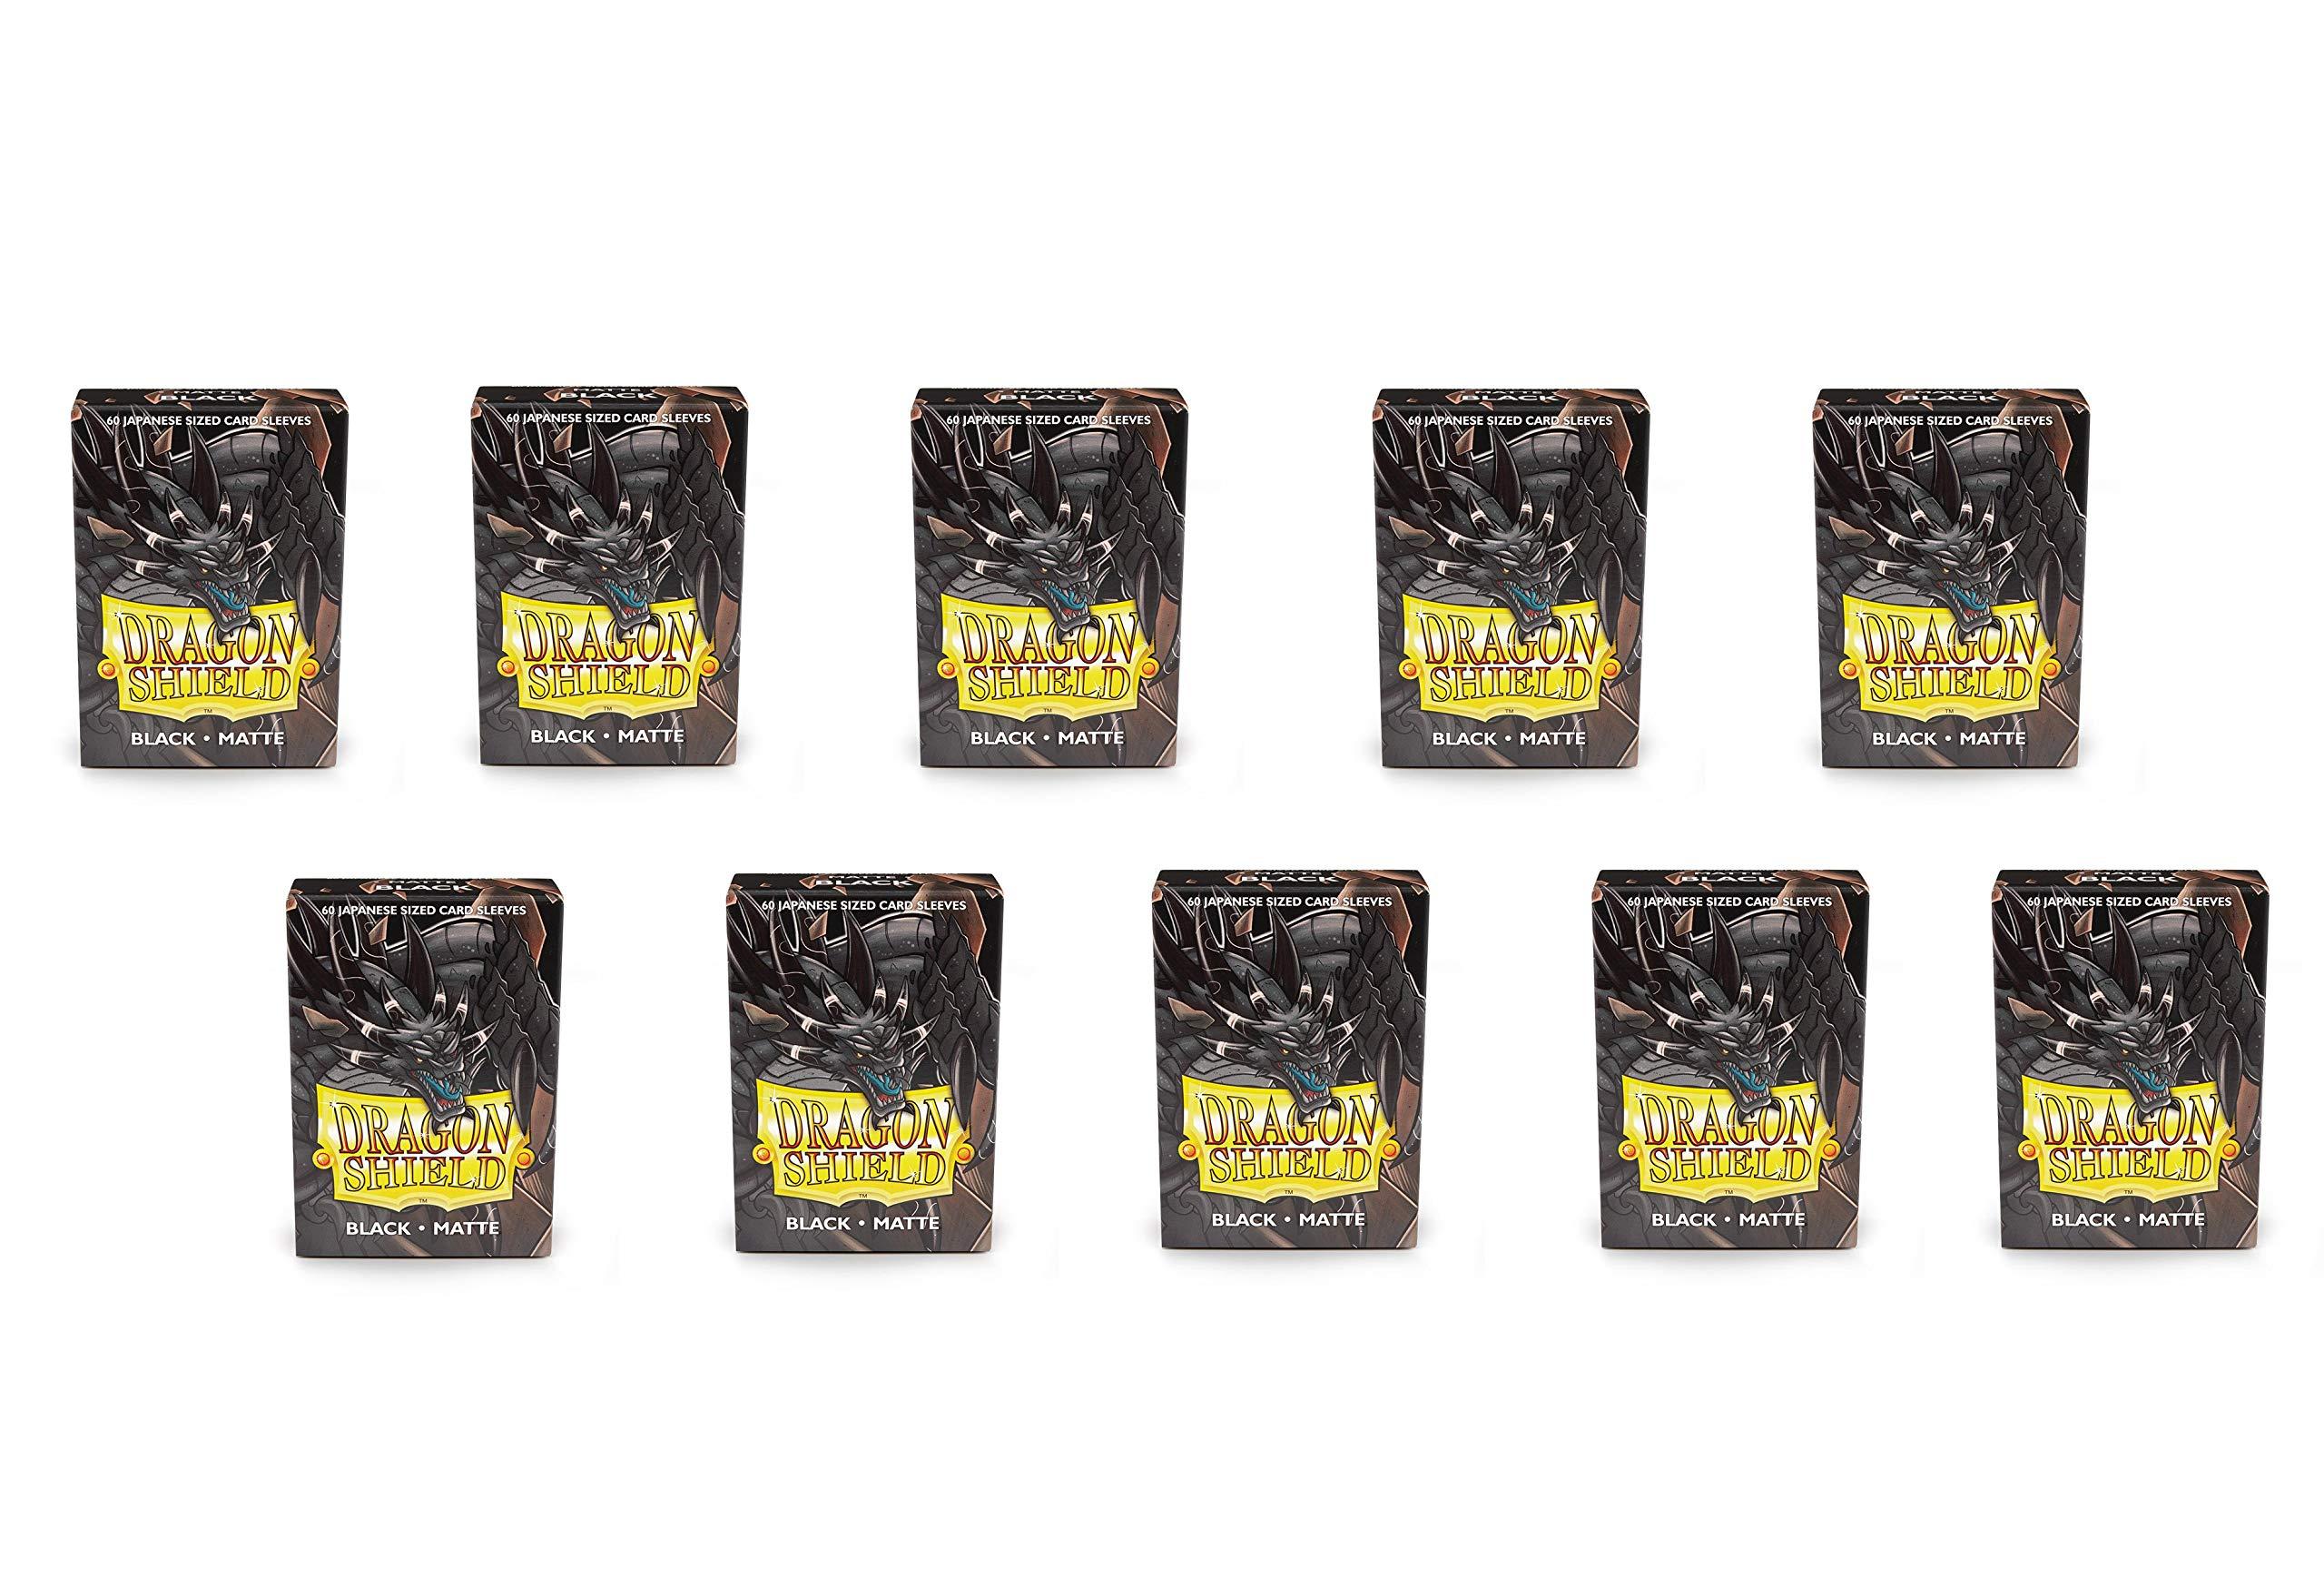 10 Packs Dragon Shield Matte Mini Japanese Black 60 ct Card Sleeves Display Case